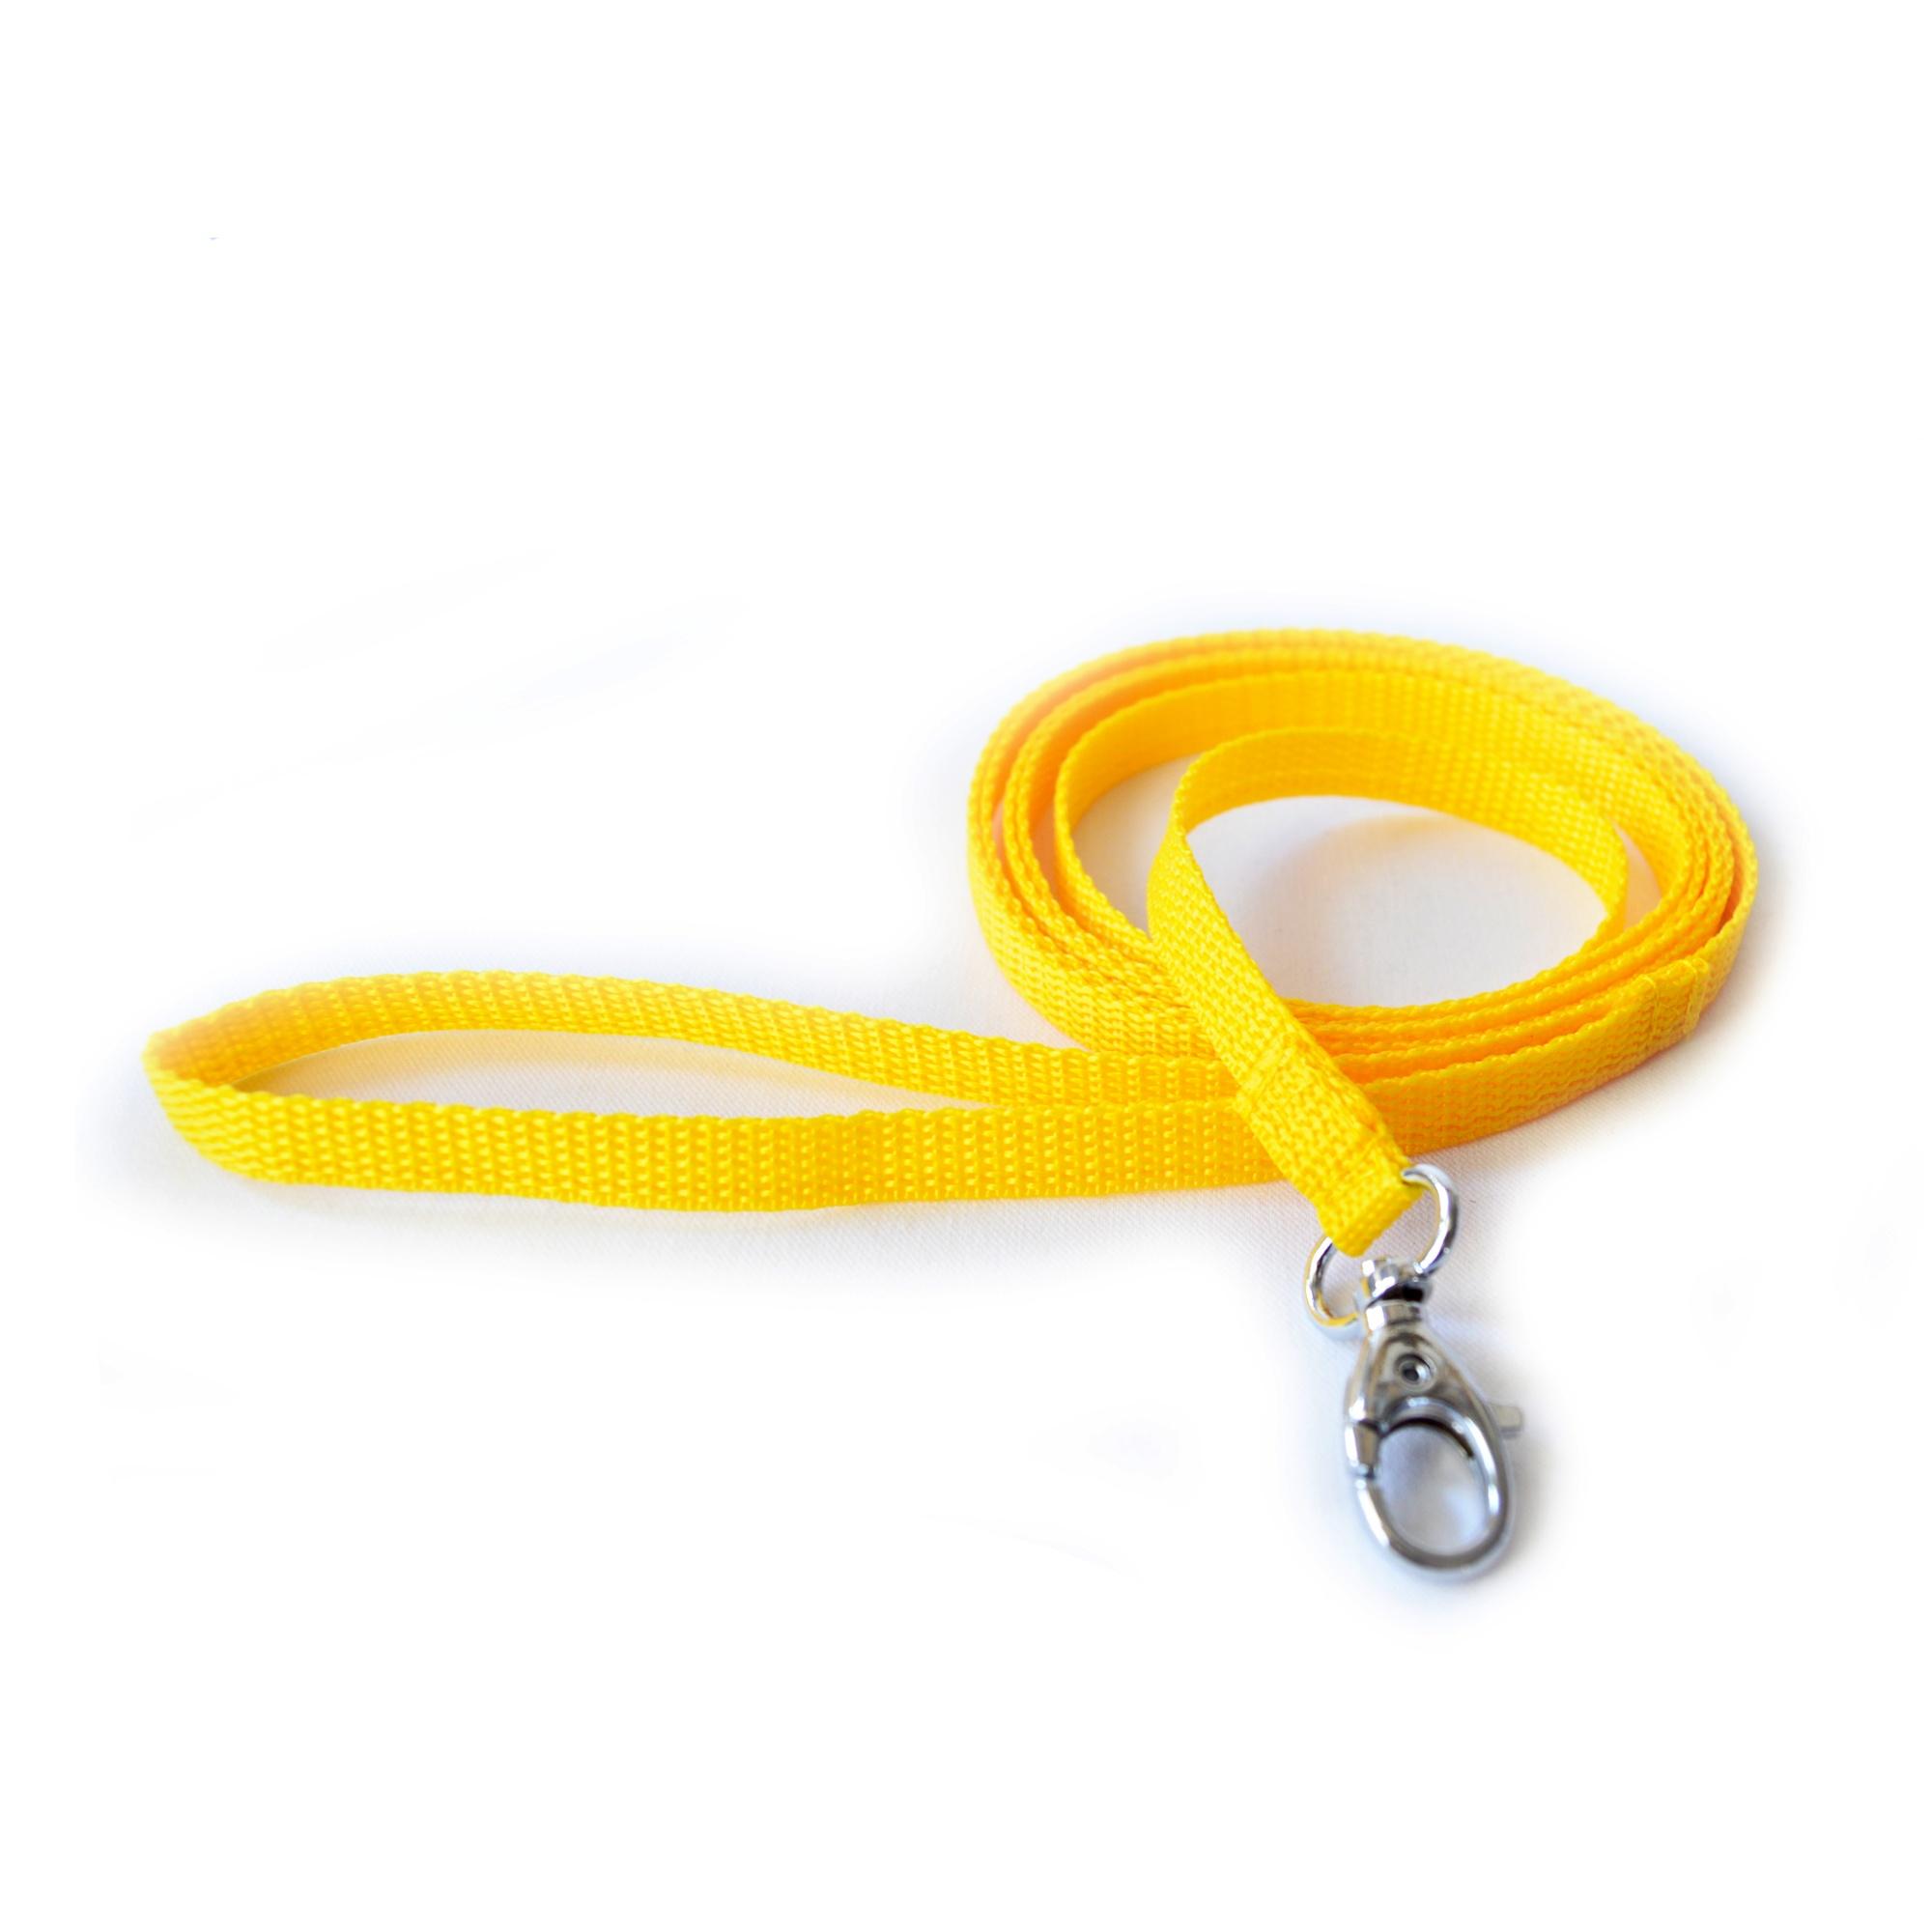 Vodítko pro psy, no. 52, žluté